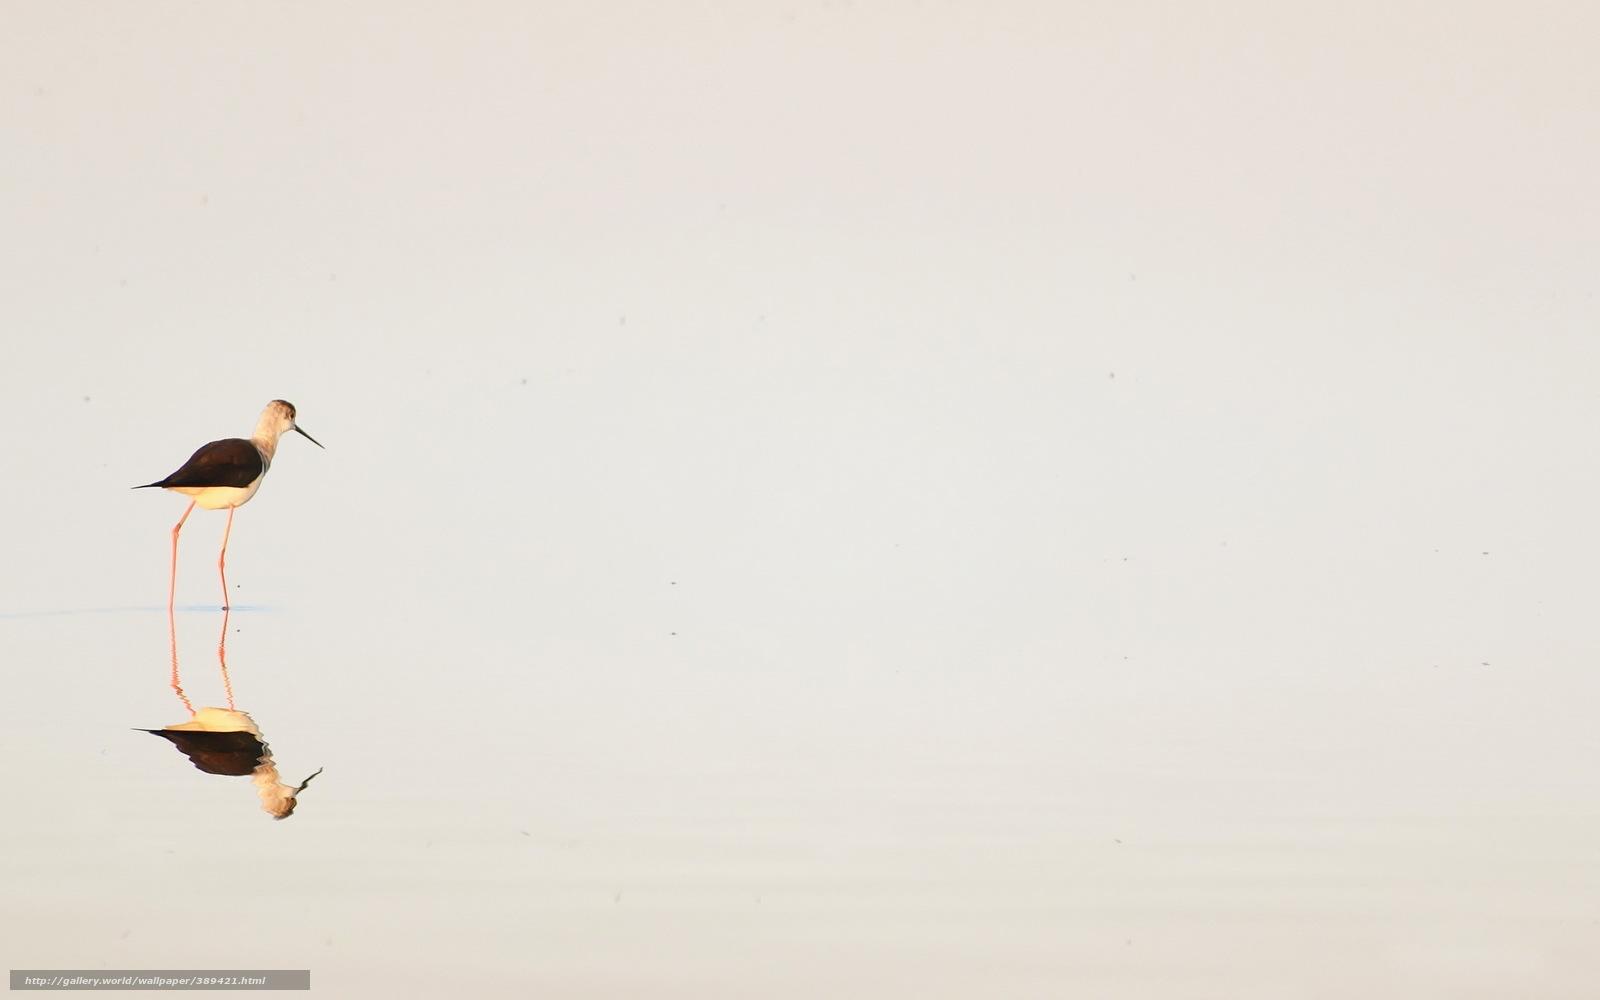 Amazing Wallpaper Bird Minimalist - 389421_ptica_voda_minimalizm_priroda_2560x1600_www  Graphic_737044.jpg